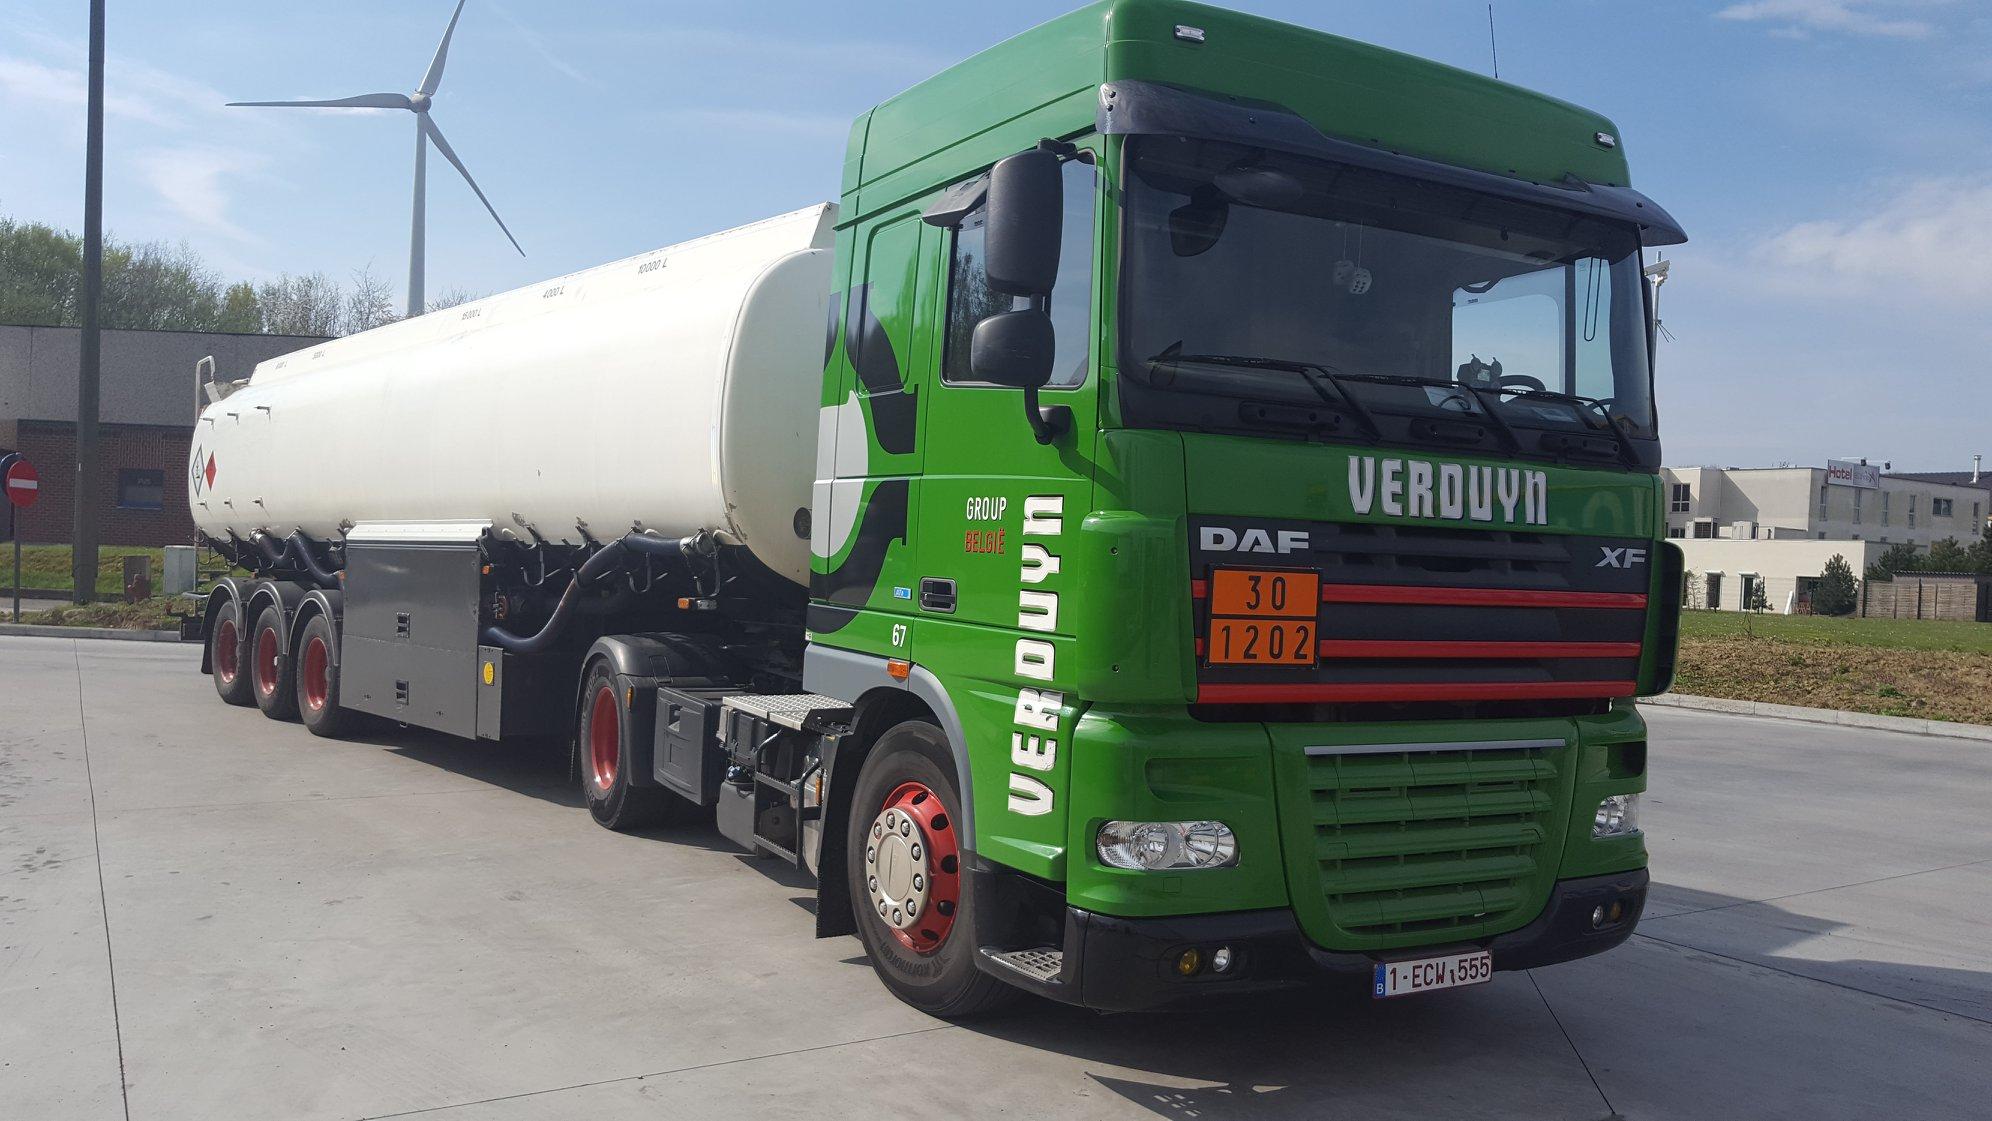 DAF-Brandstof-trailers-(1)